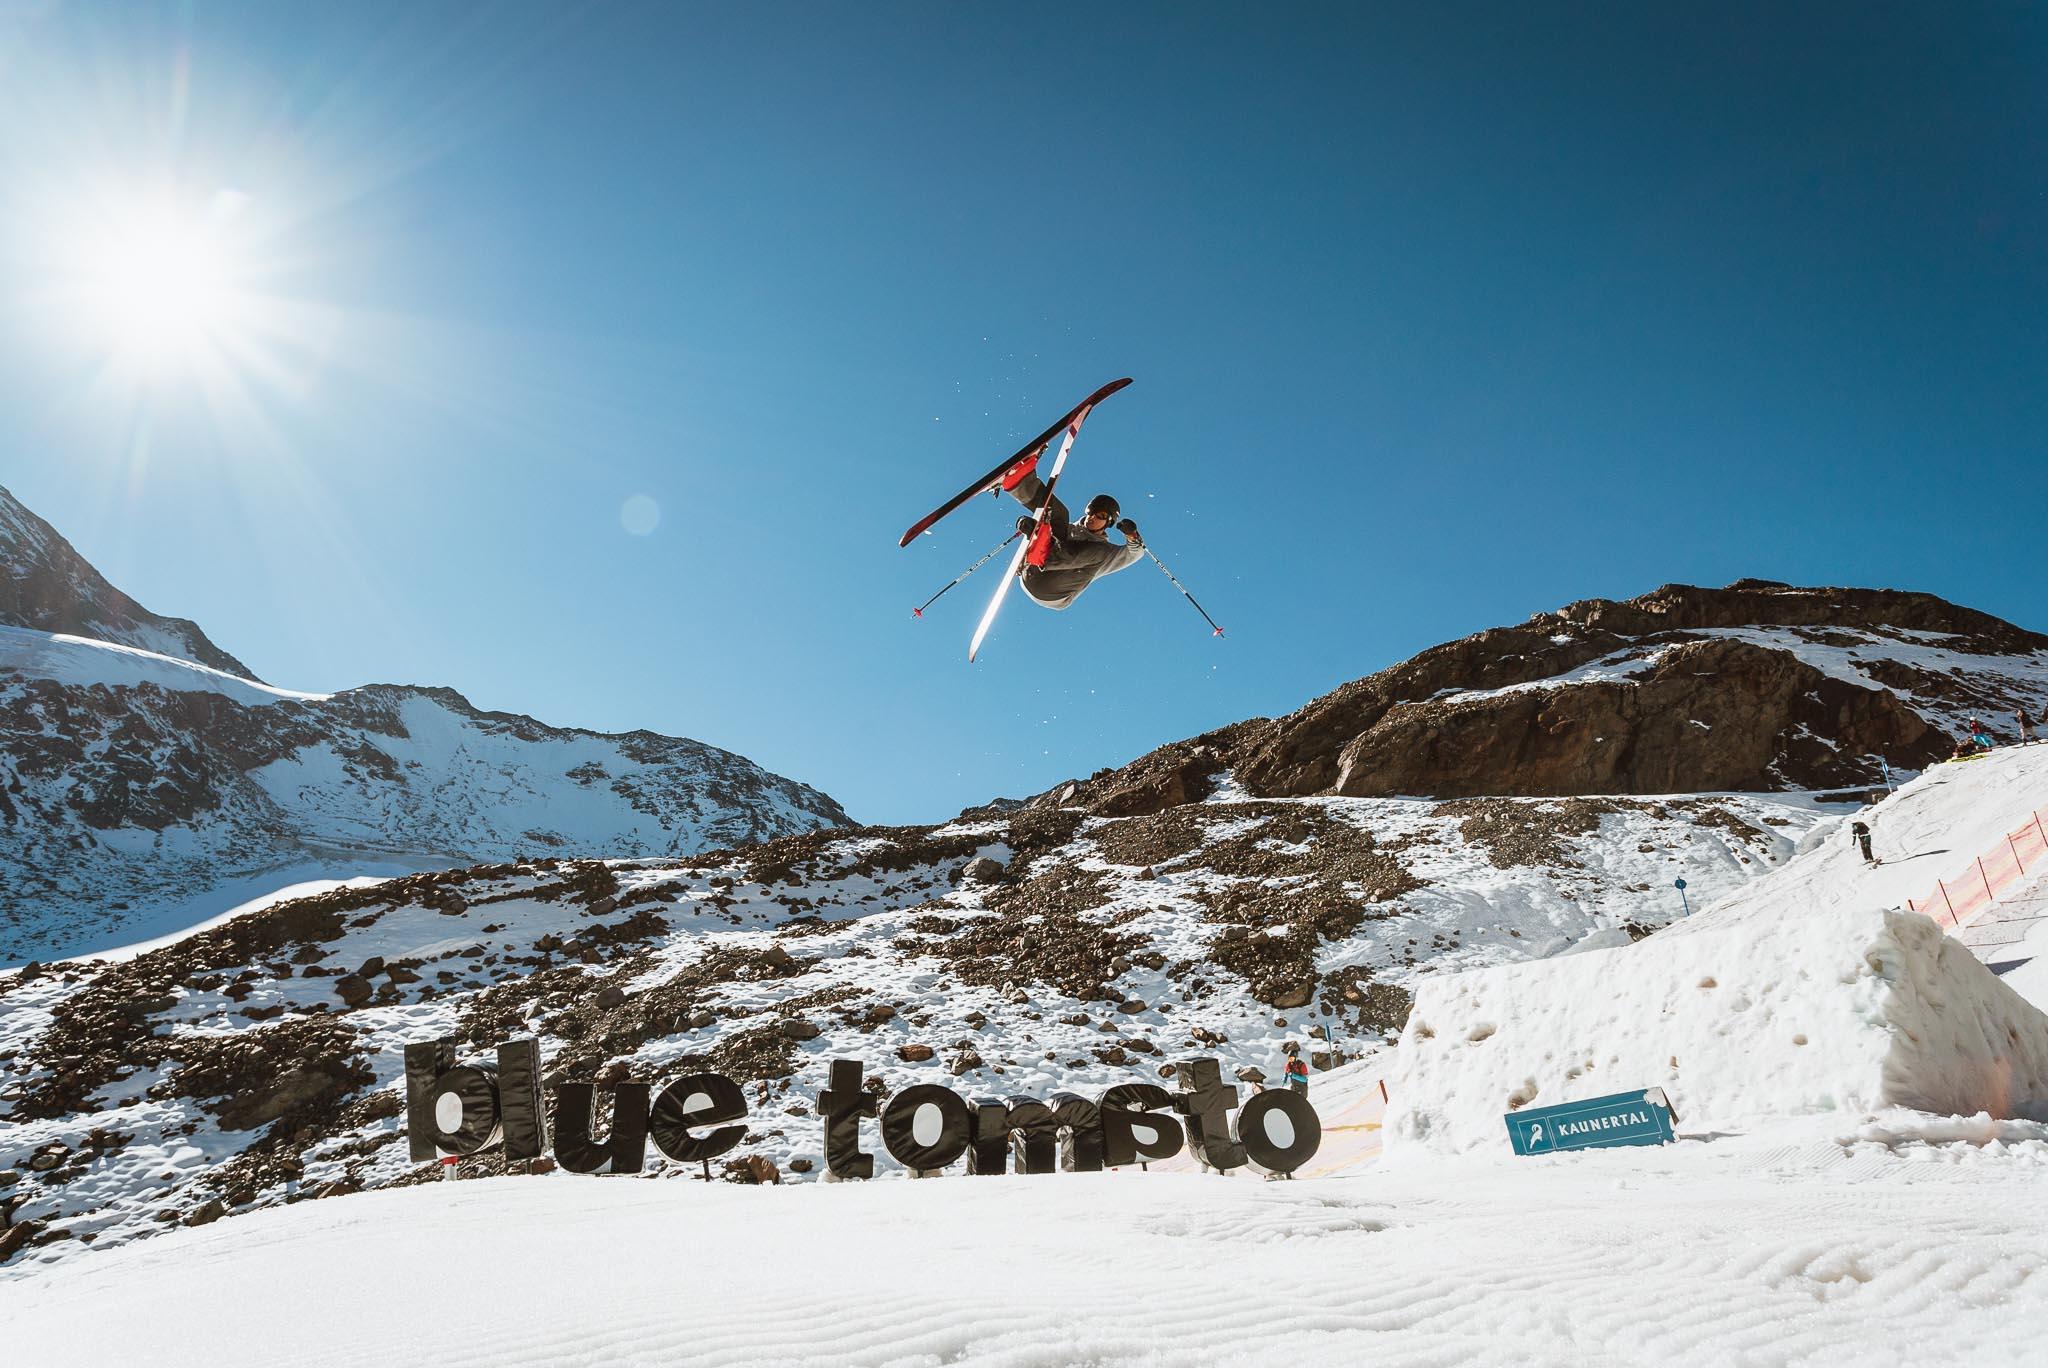 Nachbericht zum Kaunertal Opening 2018 - Rider: Johannes Rohrmoser